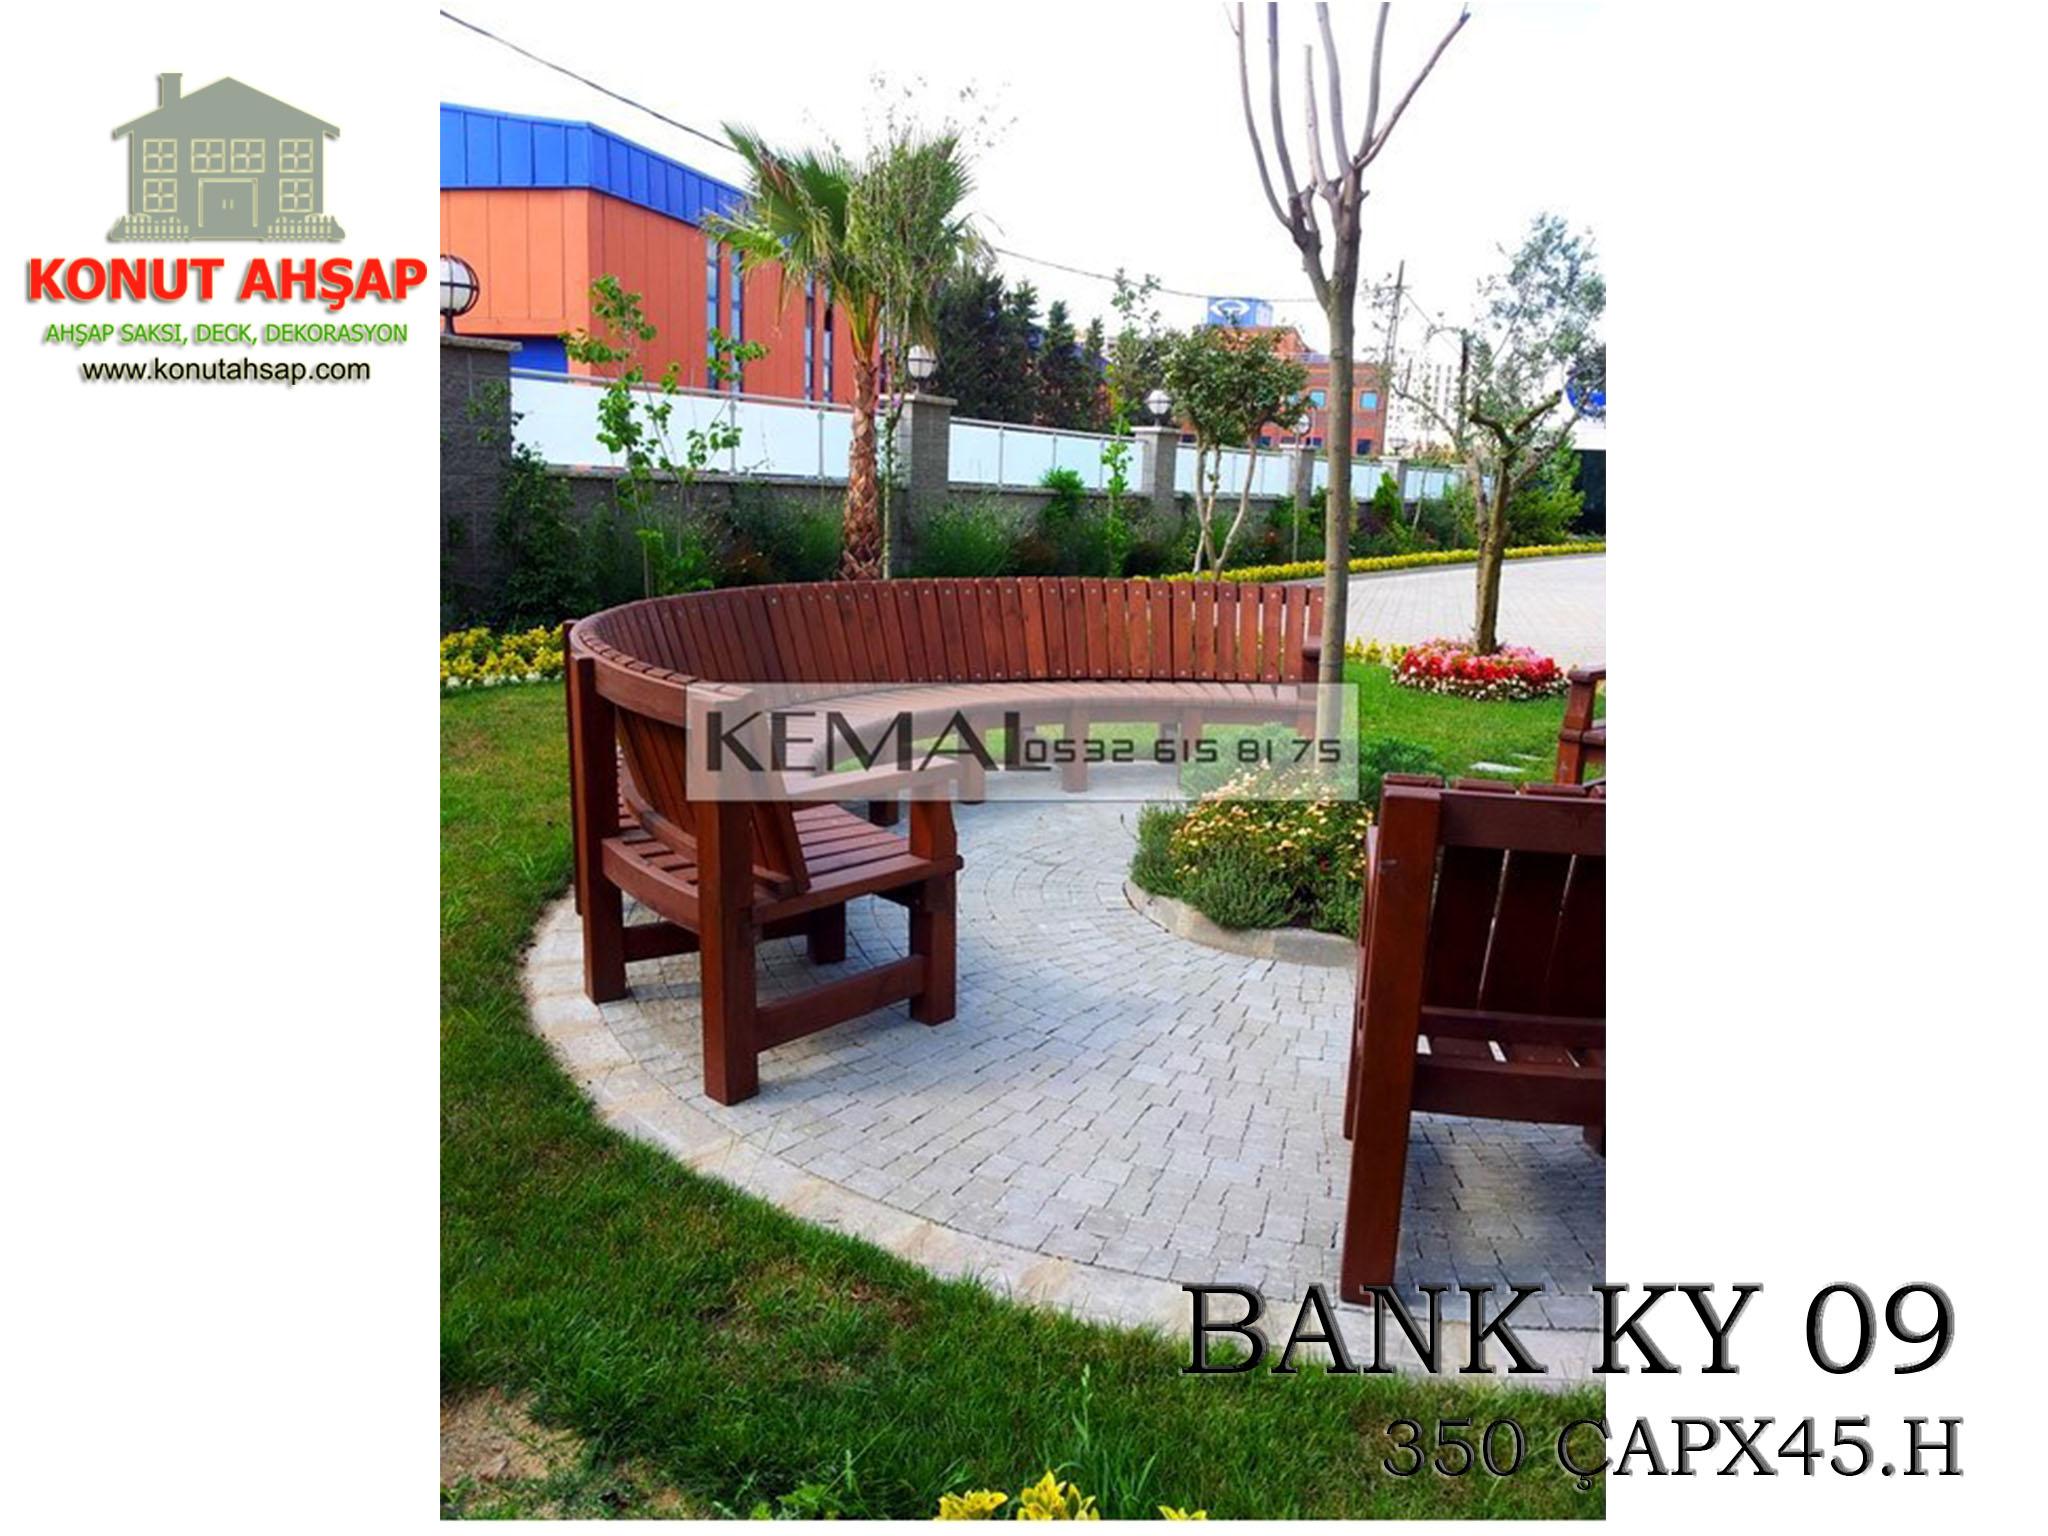 BANK KY 09